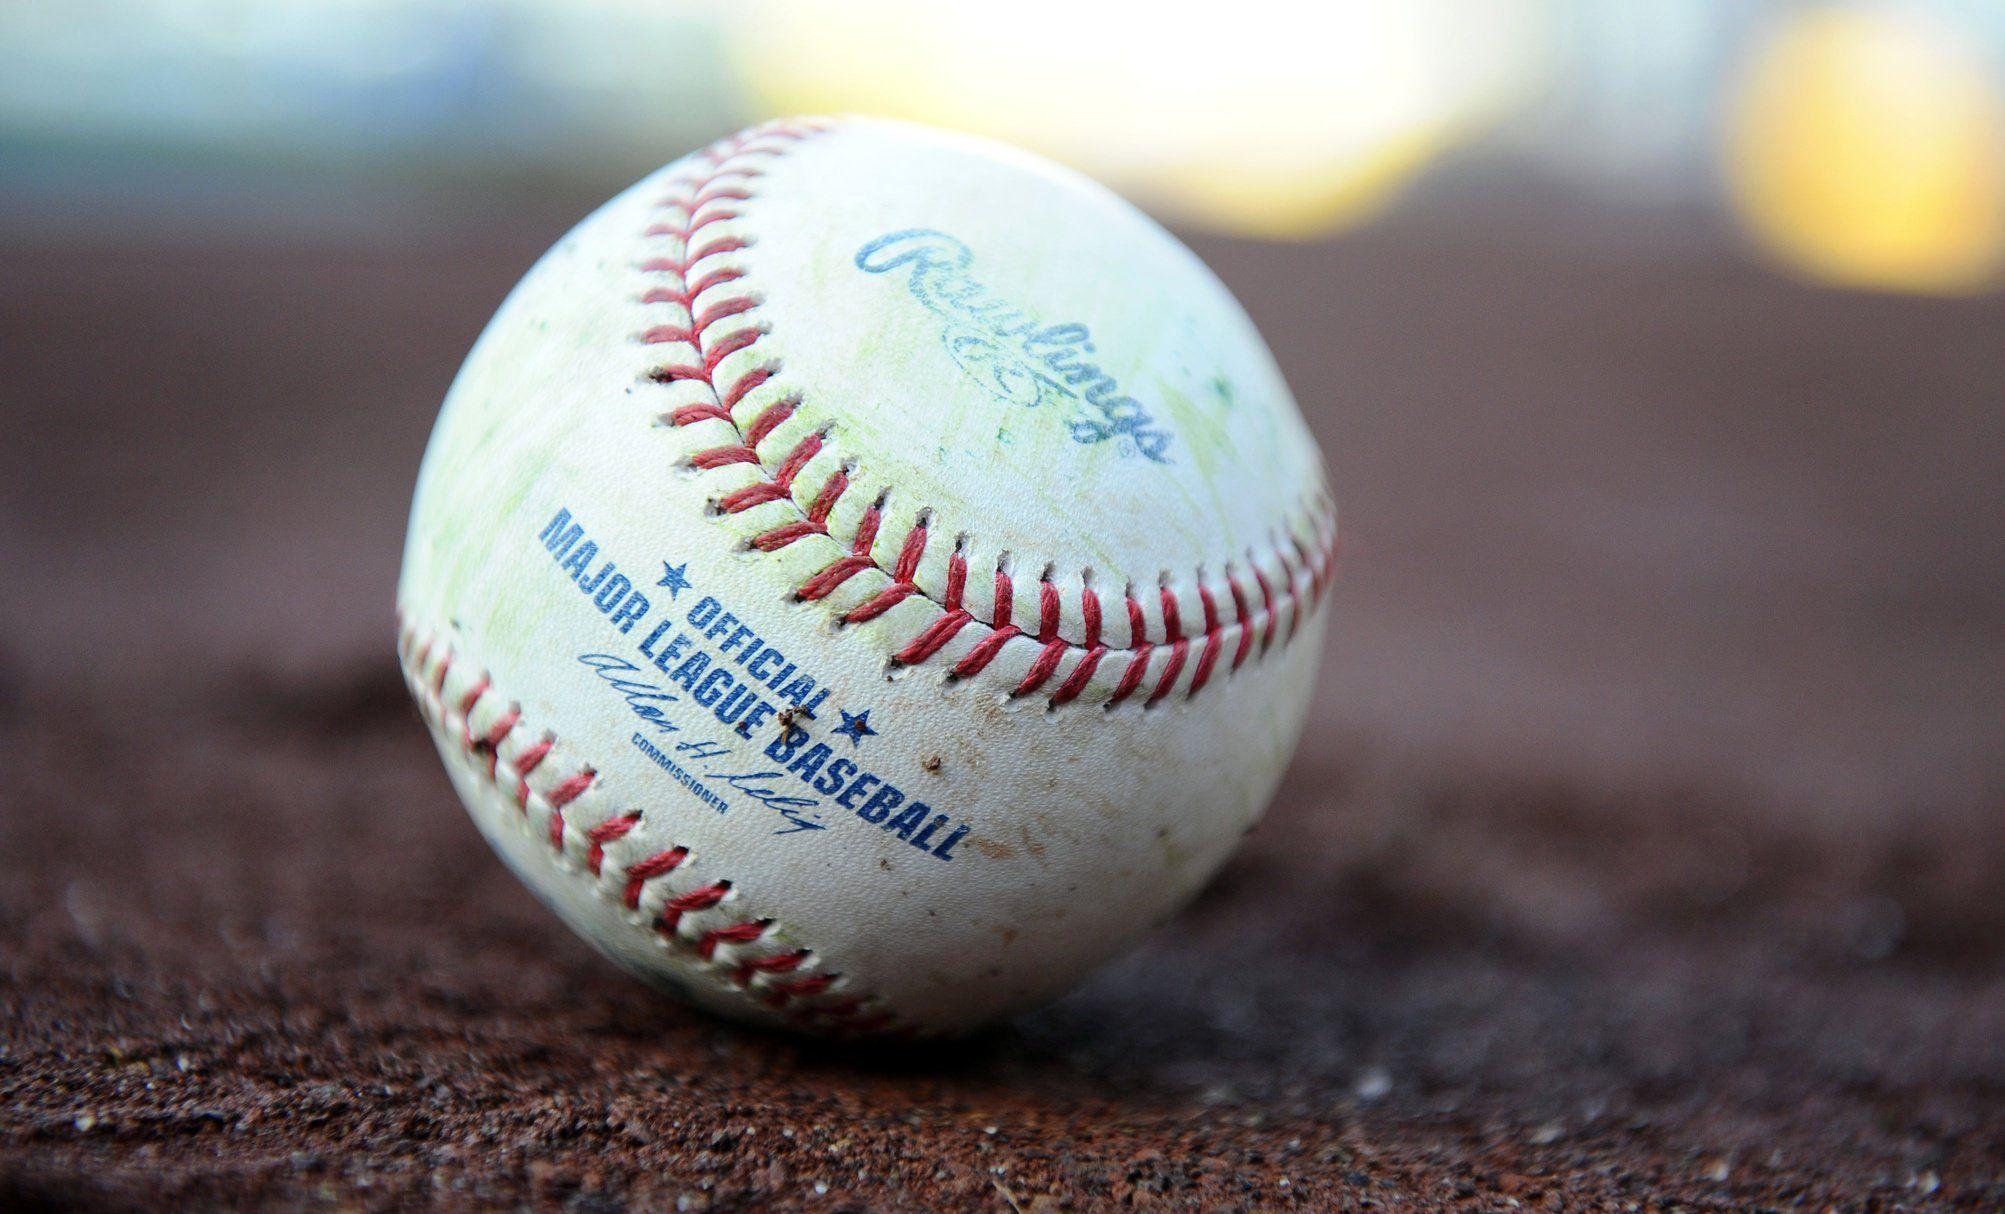 Mlb Com At Bat Updated With Customizable Team App Icon For Ios 10 3 Users Major League Baseball Baseball League